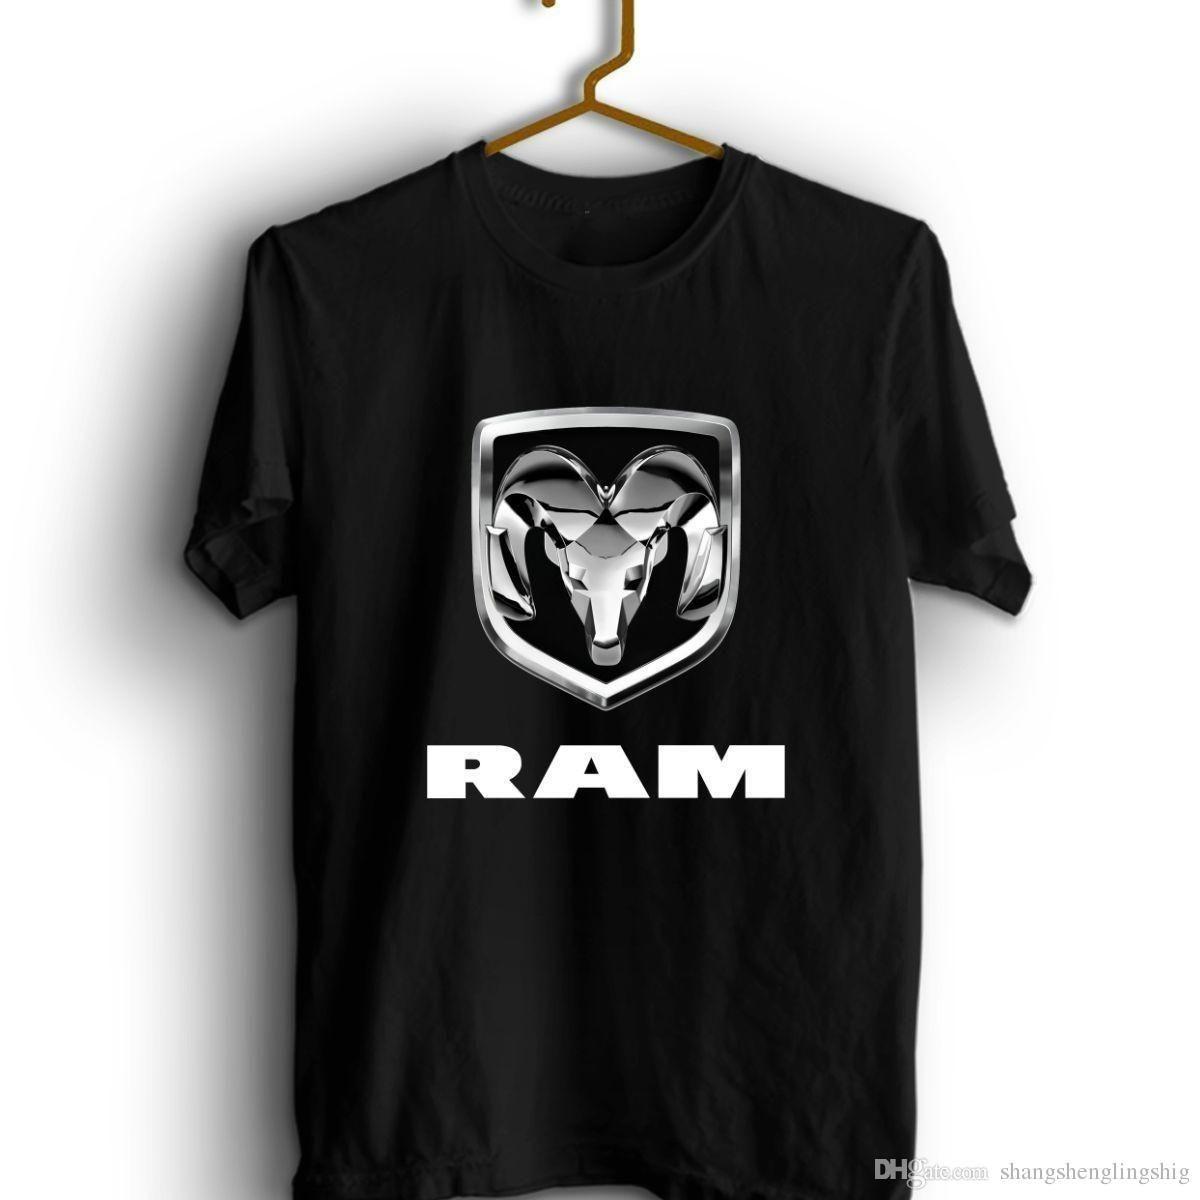 Dodge Shirt T Shirts Design Concept